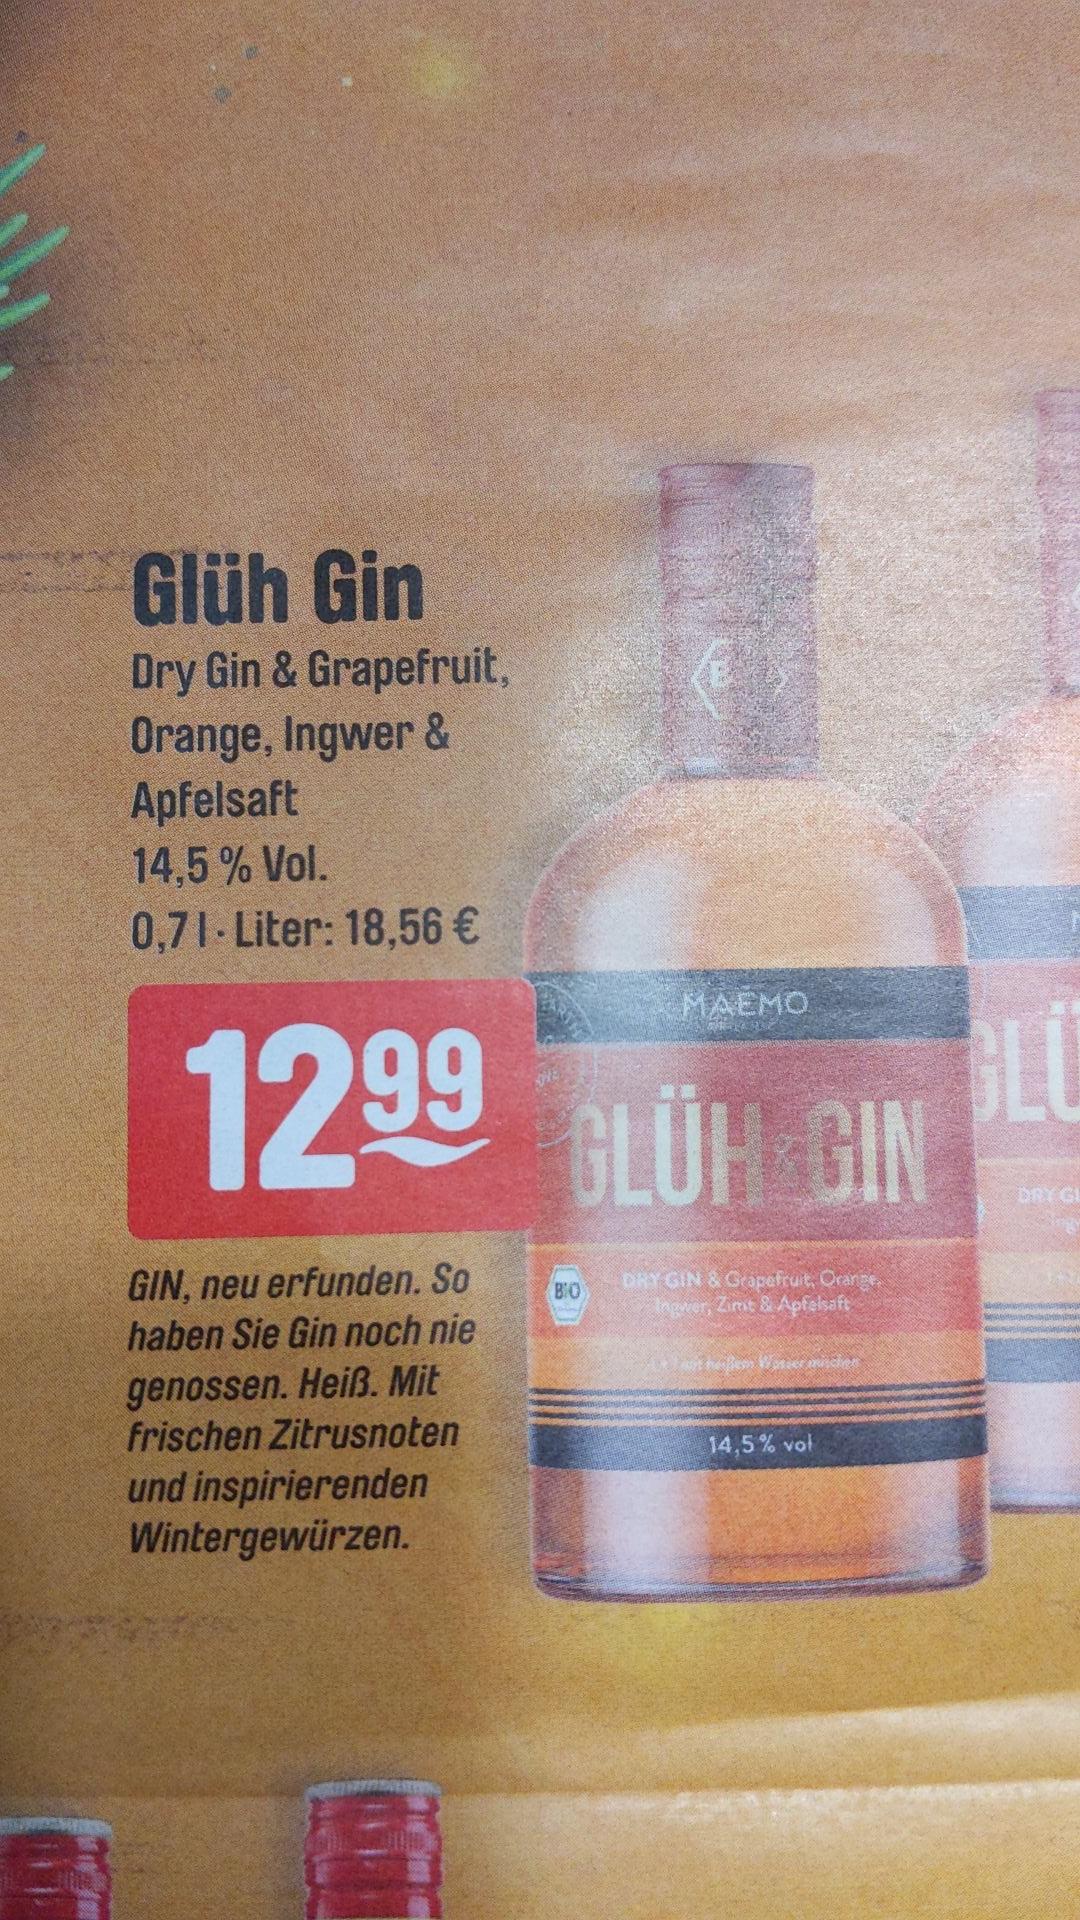 Maemo Organics Glüh & Gin 14,5% Vol., 0,7 Liter (Bio) [Getränke Hoffmann]